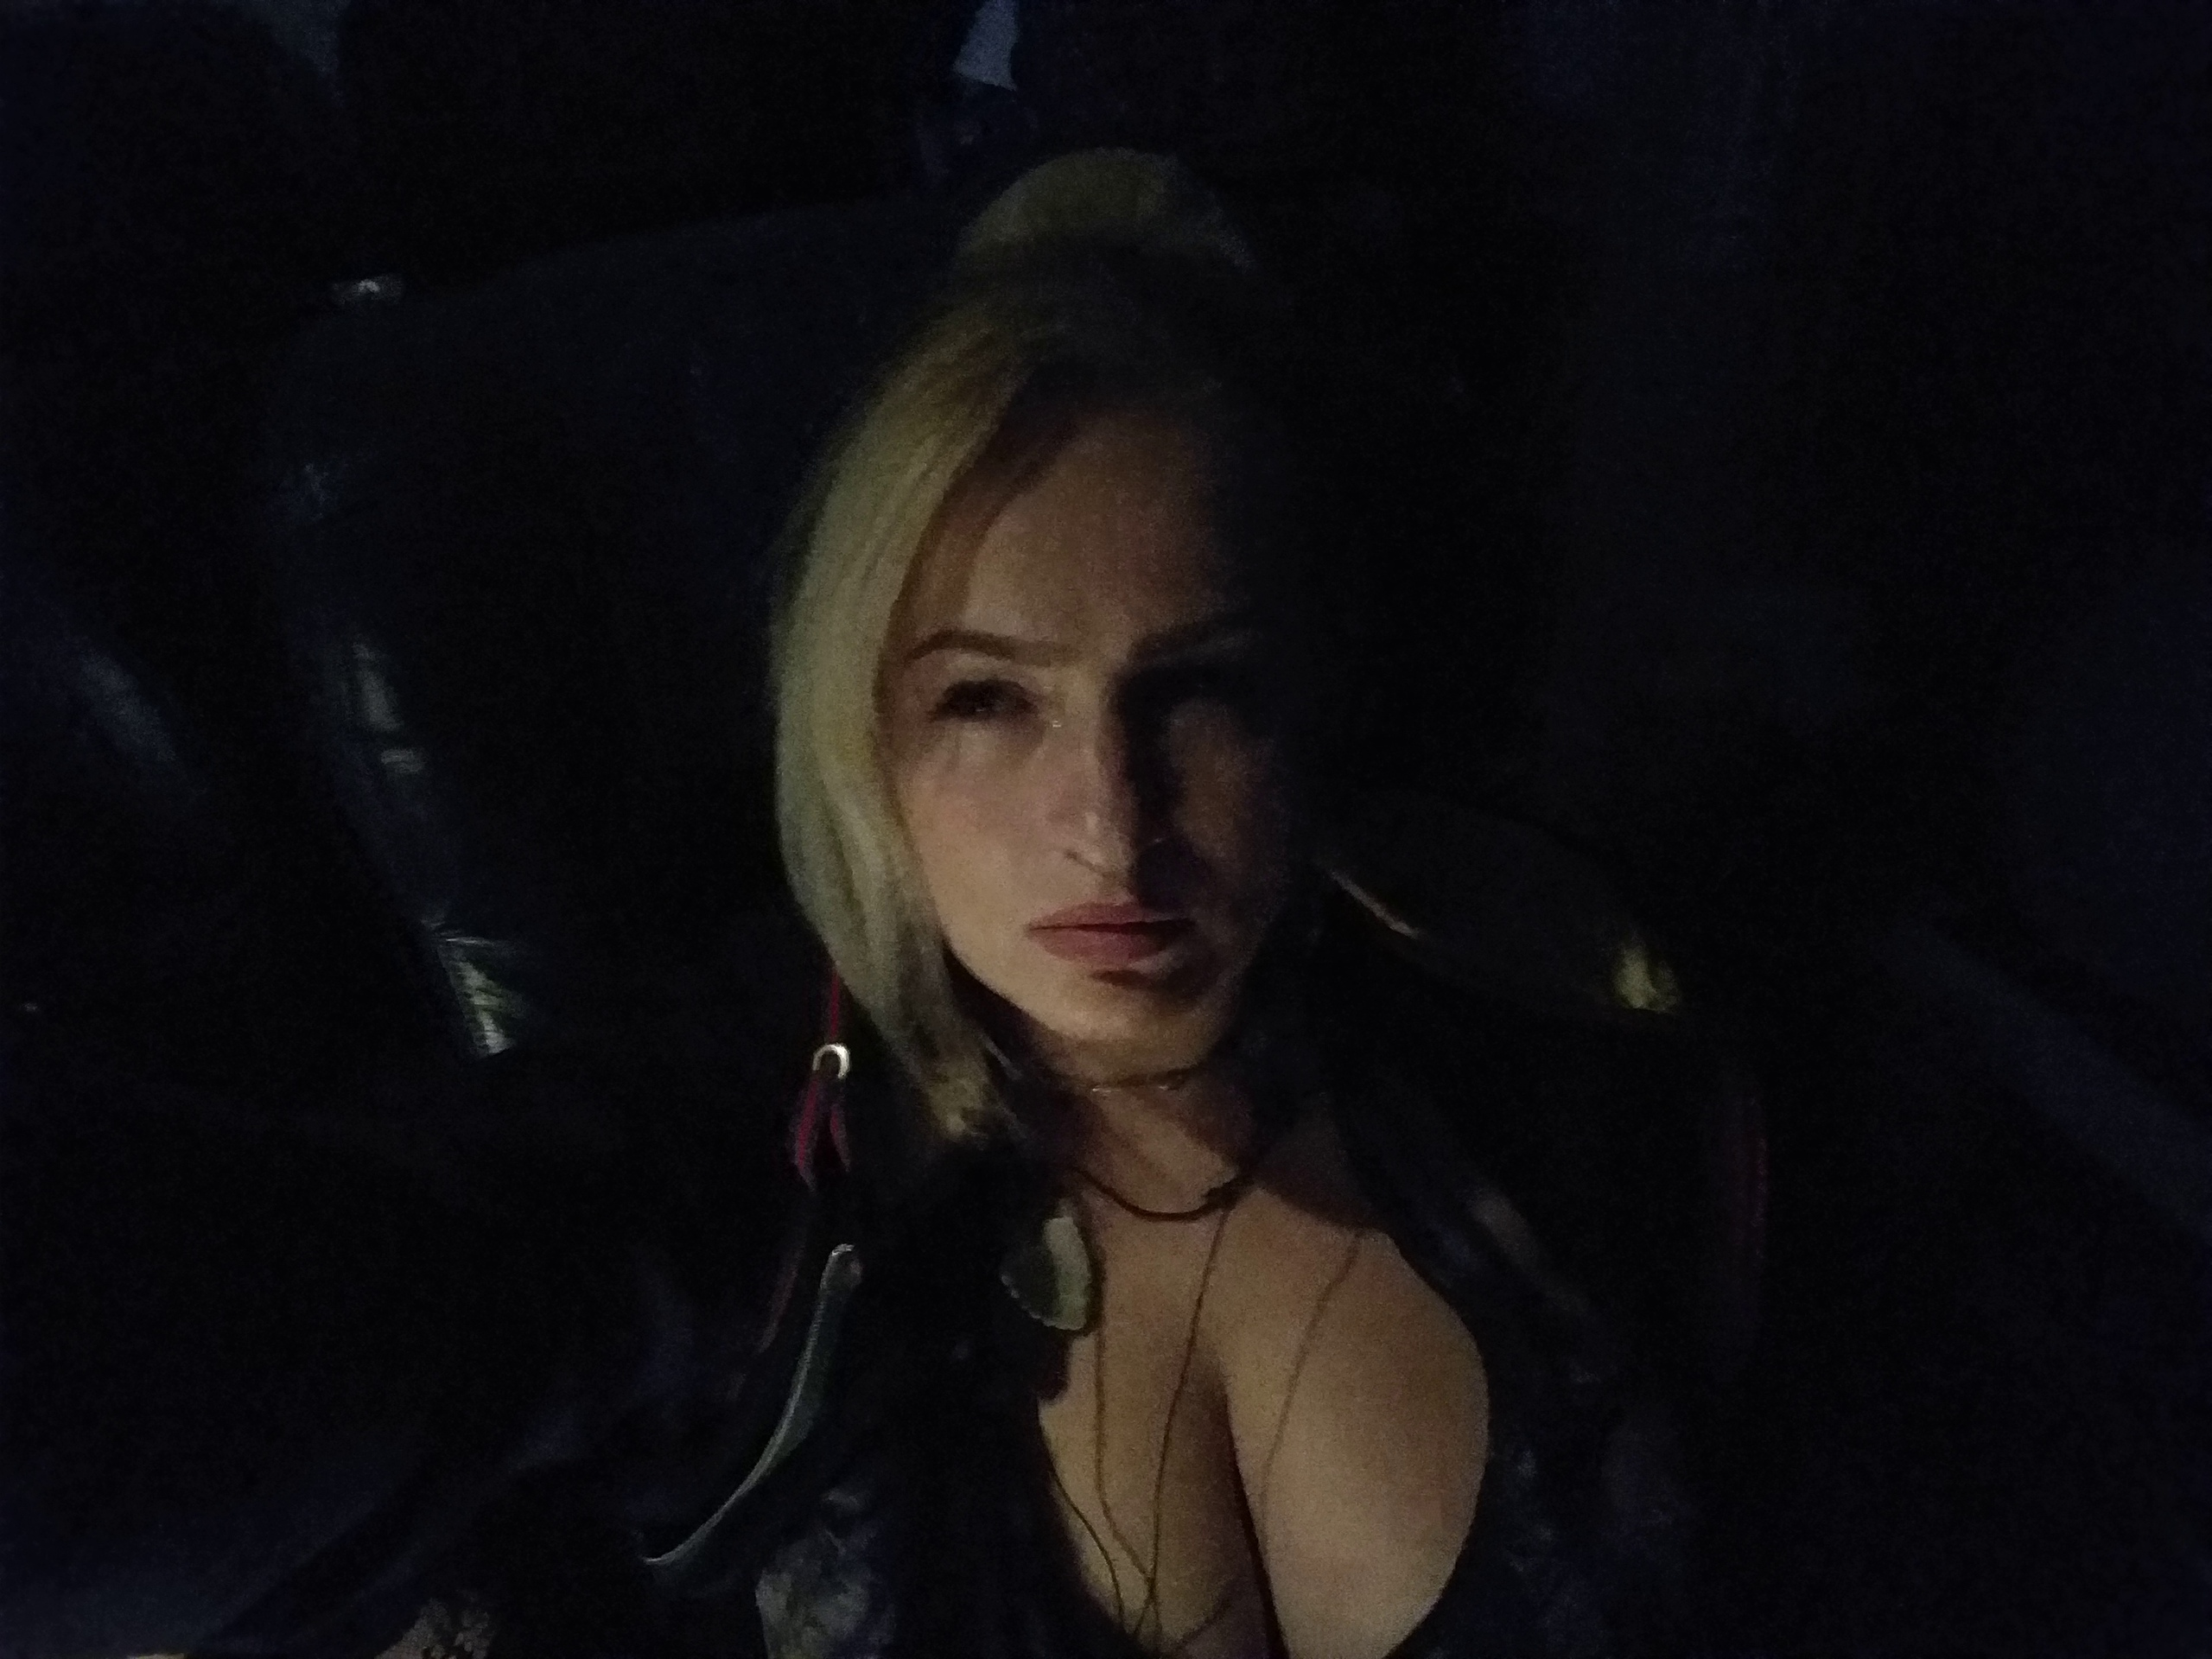 Елена Руденко (Валтея). Мои путешествия. Таиланд ( 2019 г. осень) ФОТО. KVYC15izchY